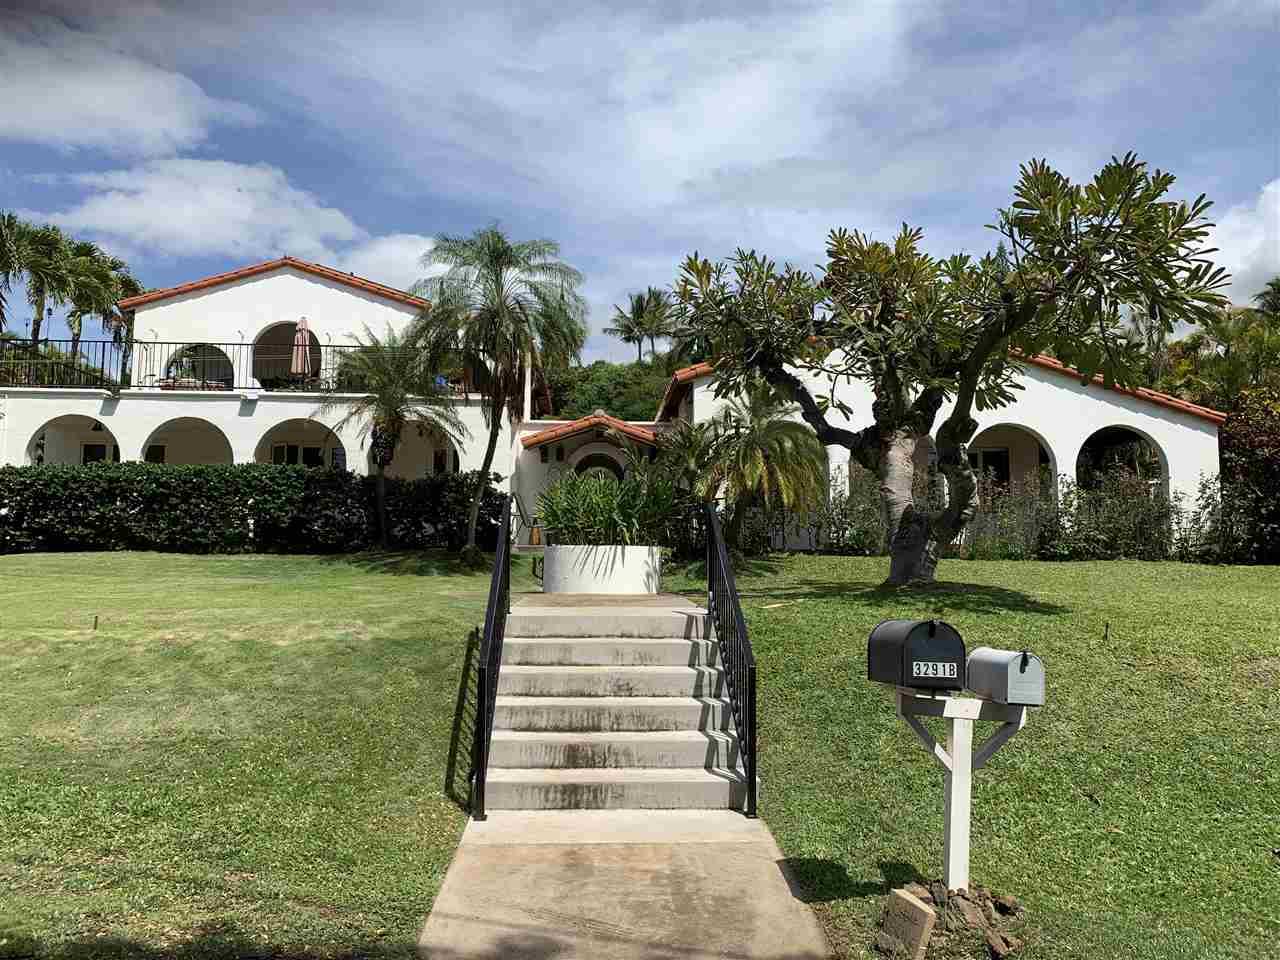 $1,800,000 - 3Br/3Ba -  for Sale in Maui Meadows, Kihei